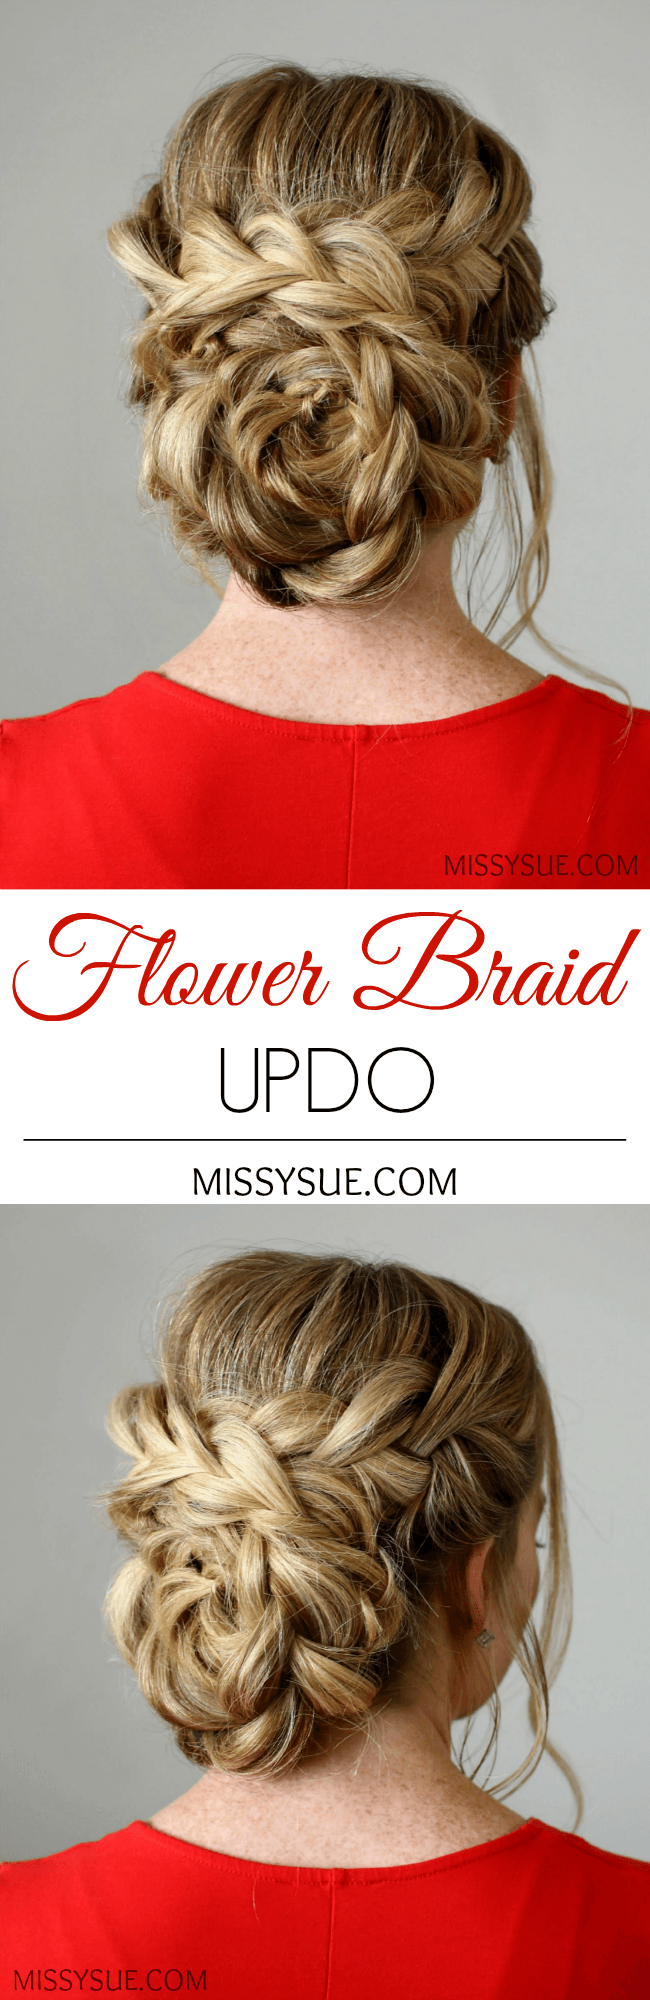 Awe Inspiring Flower Braid Updo Missy Sue Short Hairstyles For Black Women Fulllsitofus